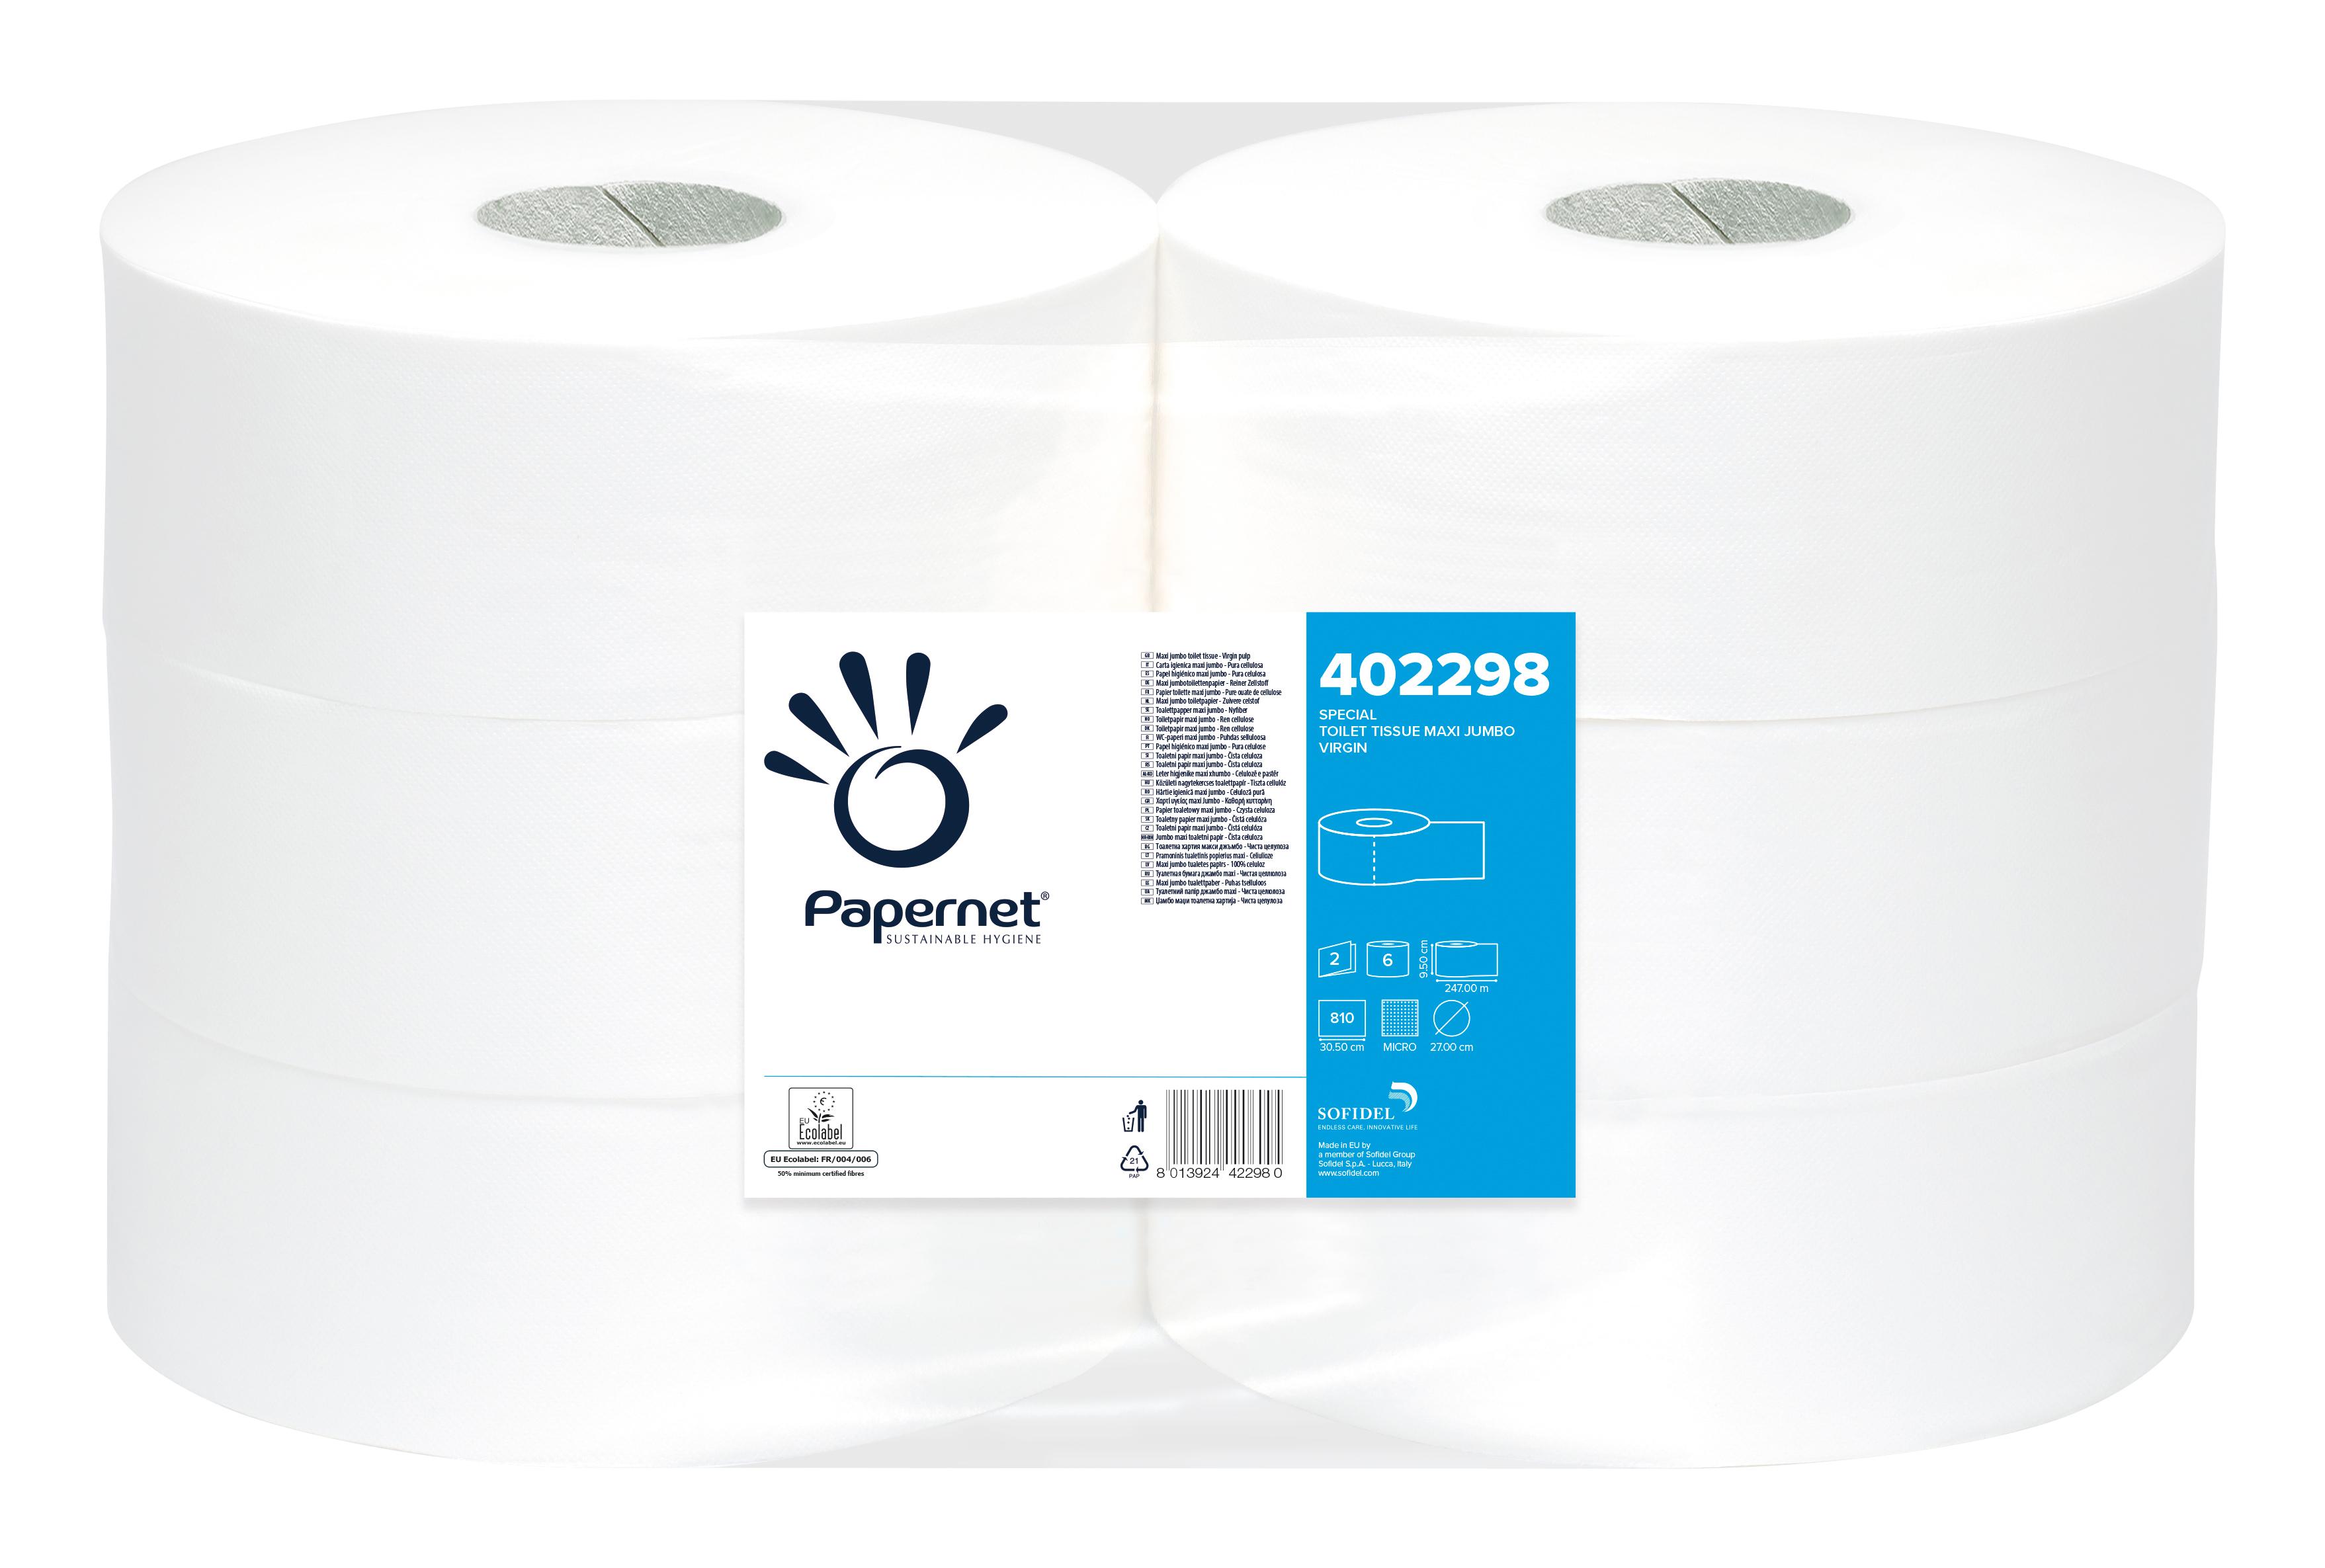 Papernet® WC Jumbo rull, pakis 6x247m, 2-kihiline, valge